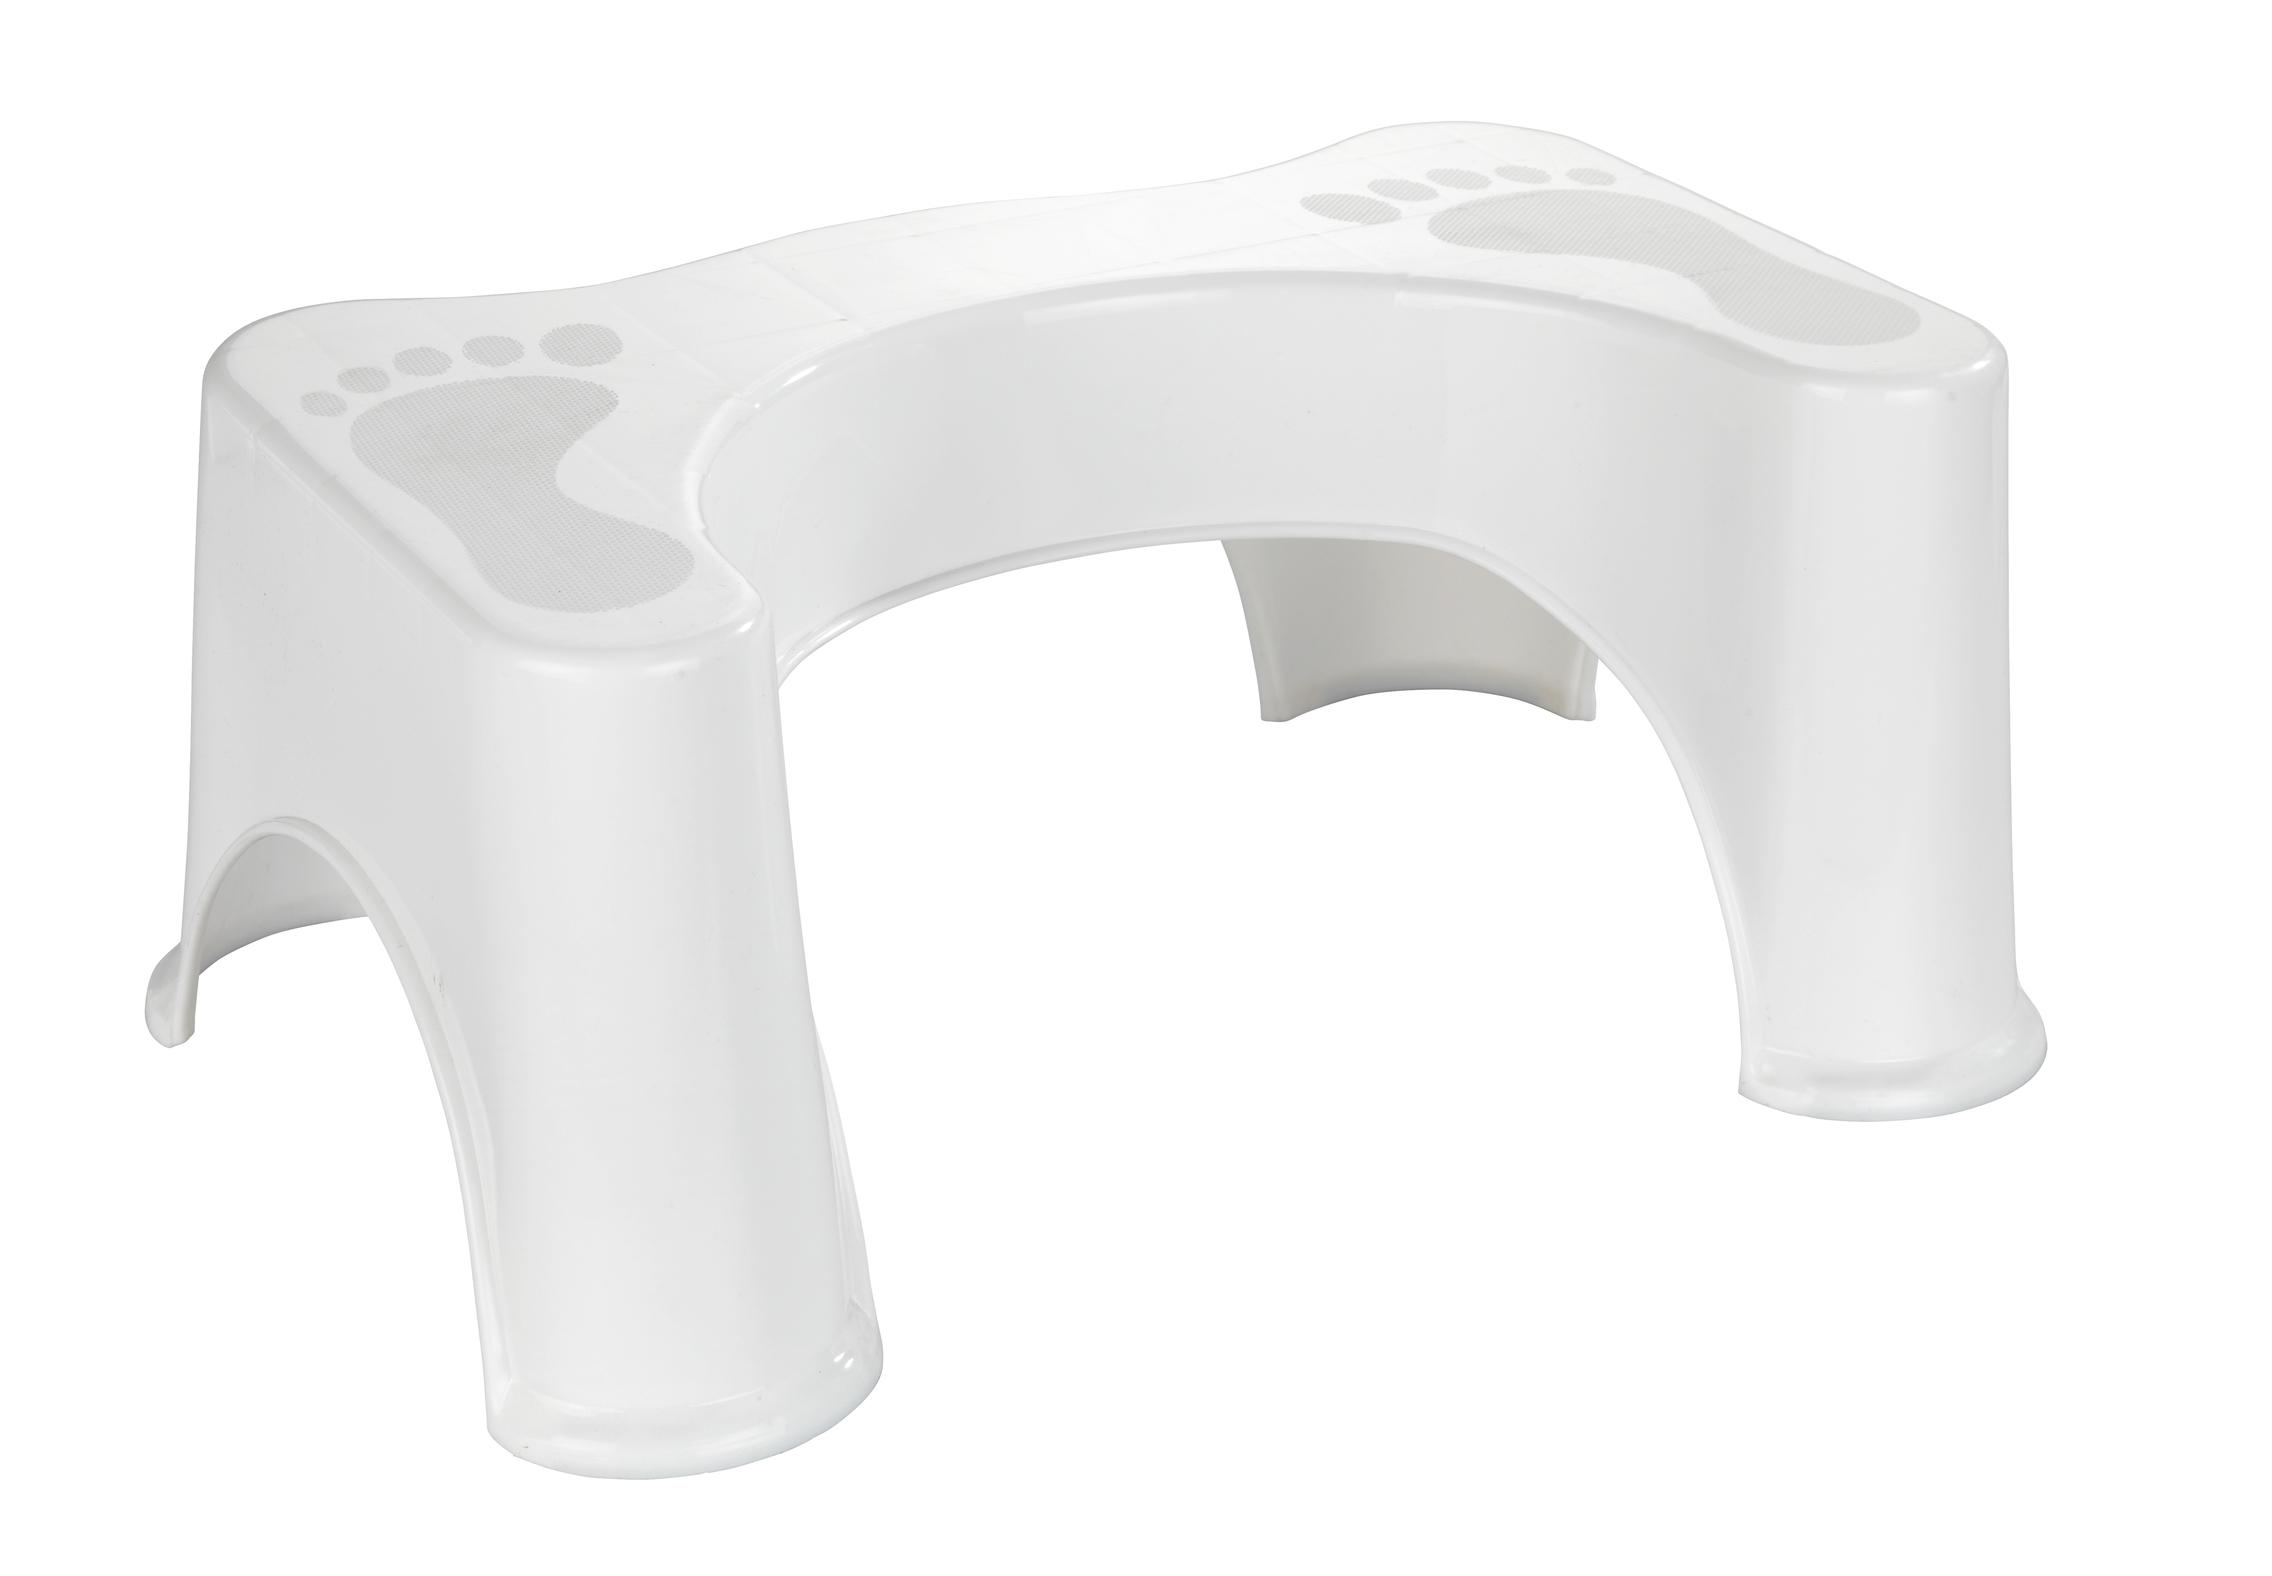 Inaltator / Treapta din plastic pentru toaleta, Secura Premium Alb, l48xA33,5xH20,5 cm poza